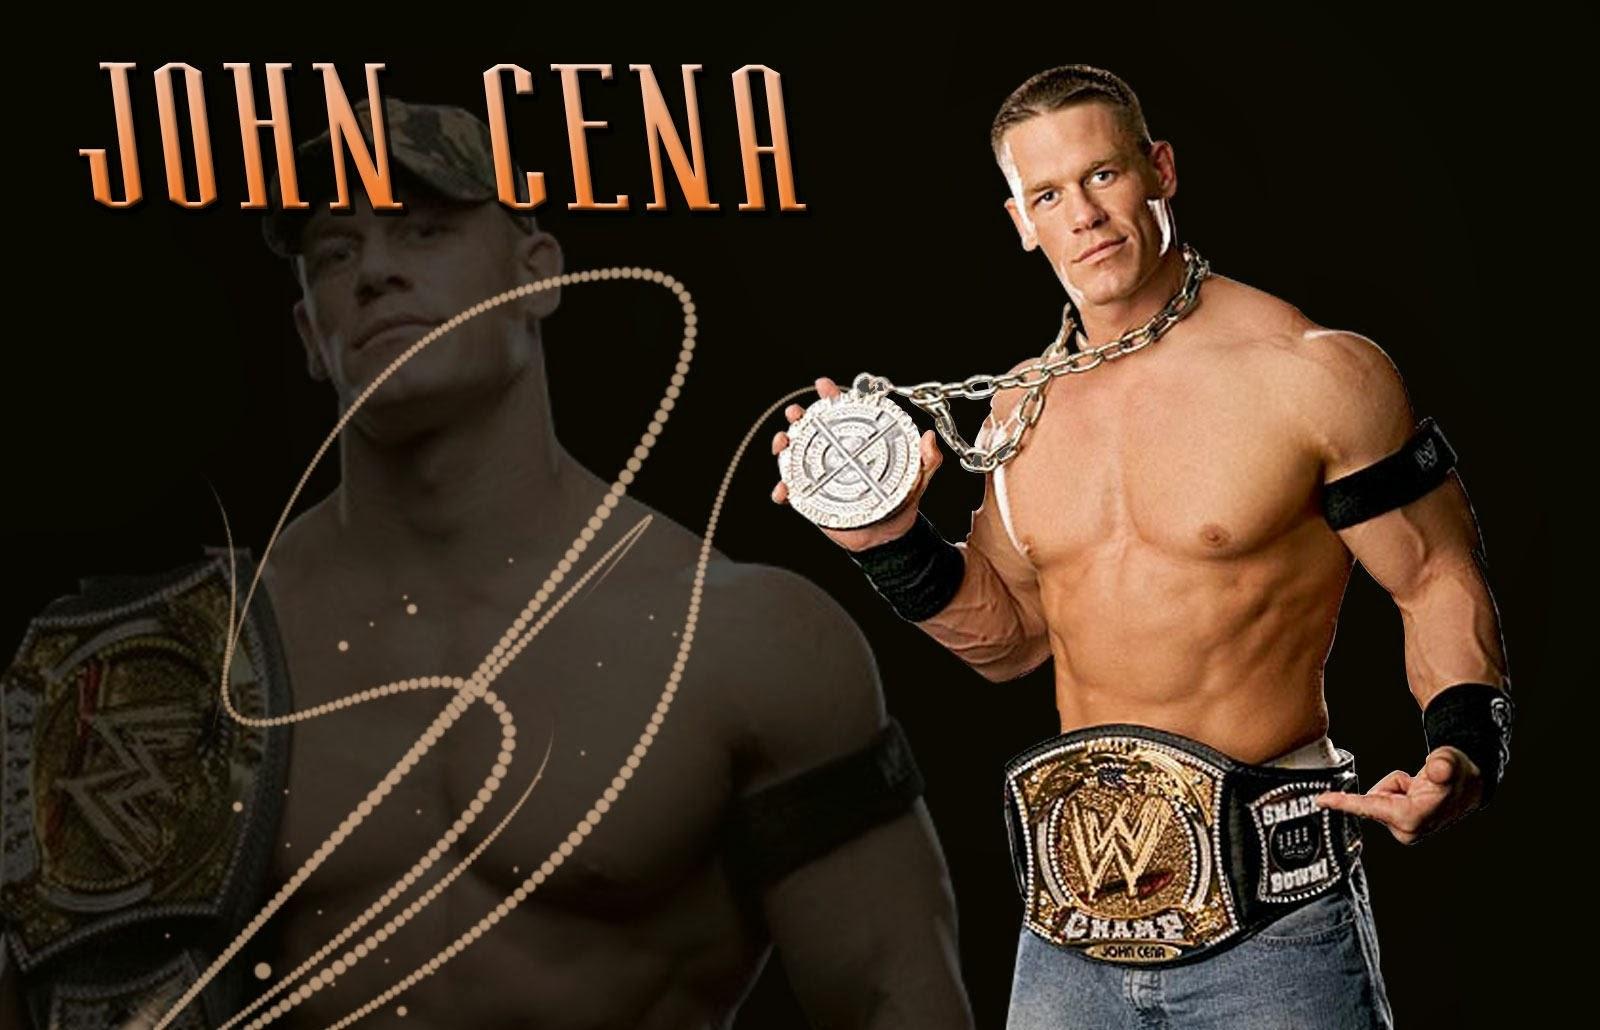 John Cena Wallpaper 2013 World Heavyweight Champion